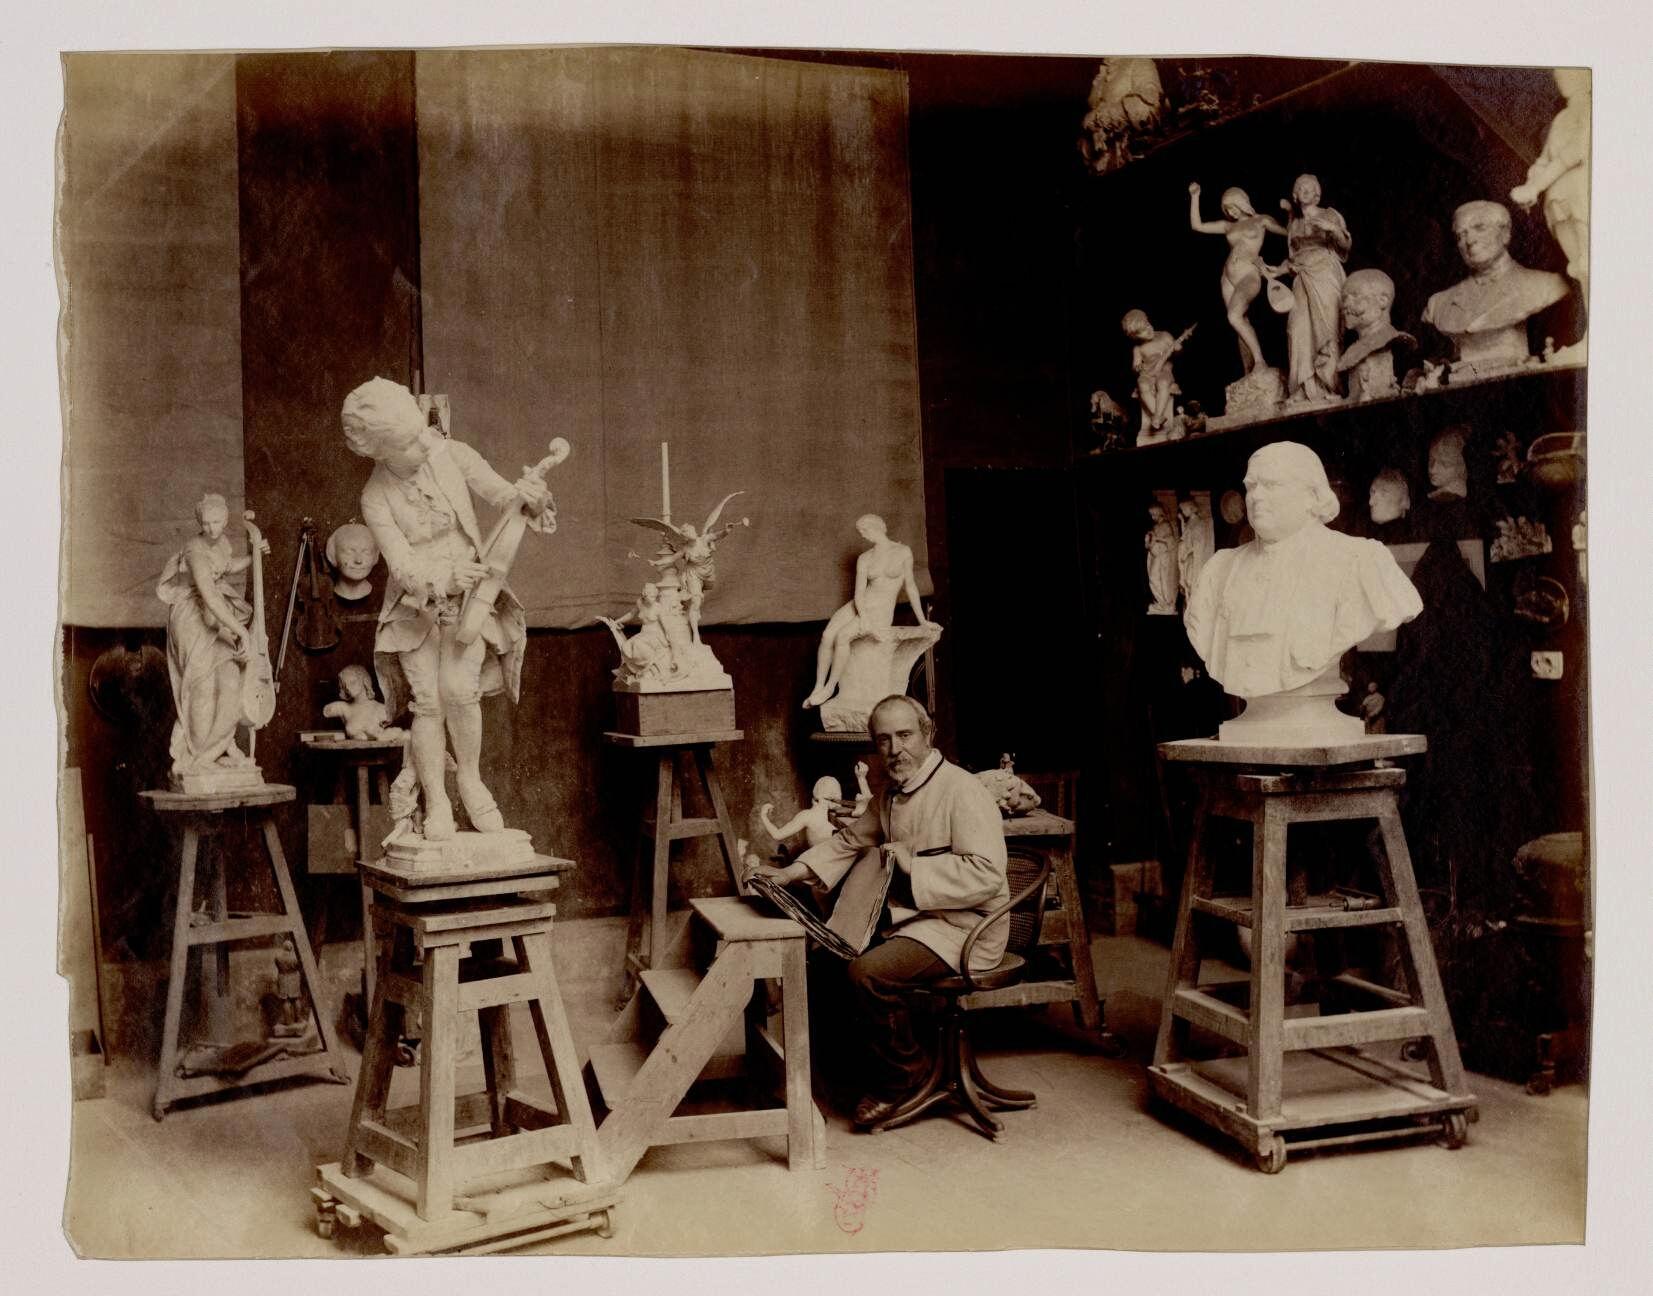 14. Луи-Эрнест Барриа (1841-1905) — французский скульптор Beaux Arts школы